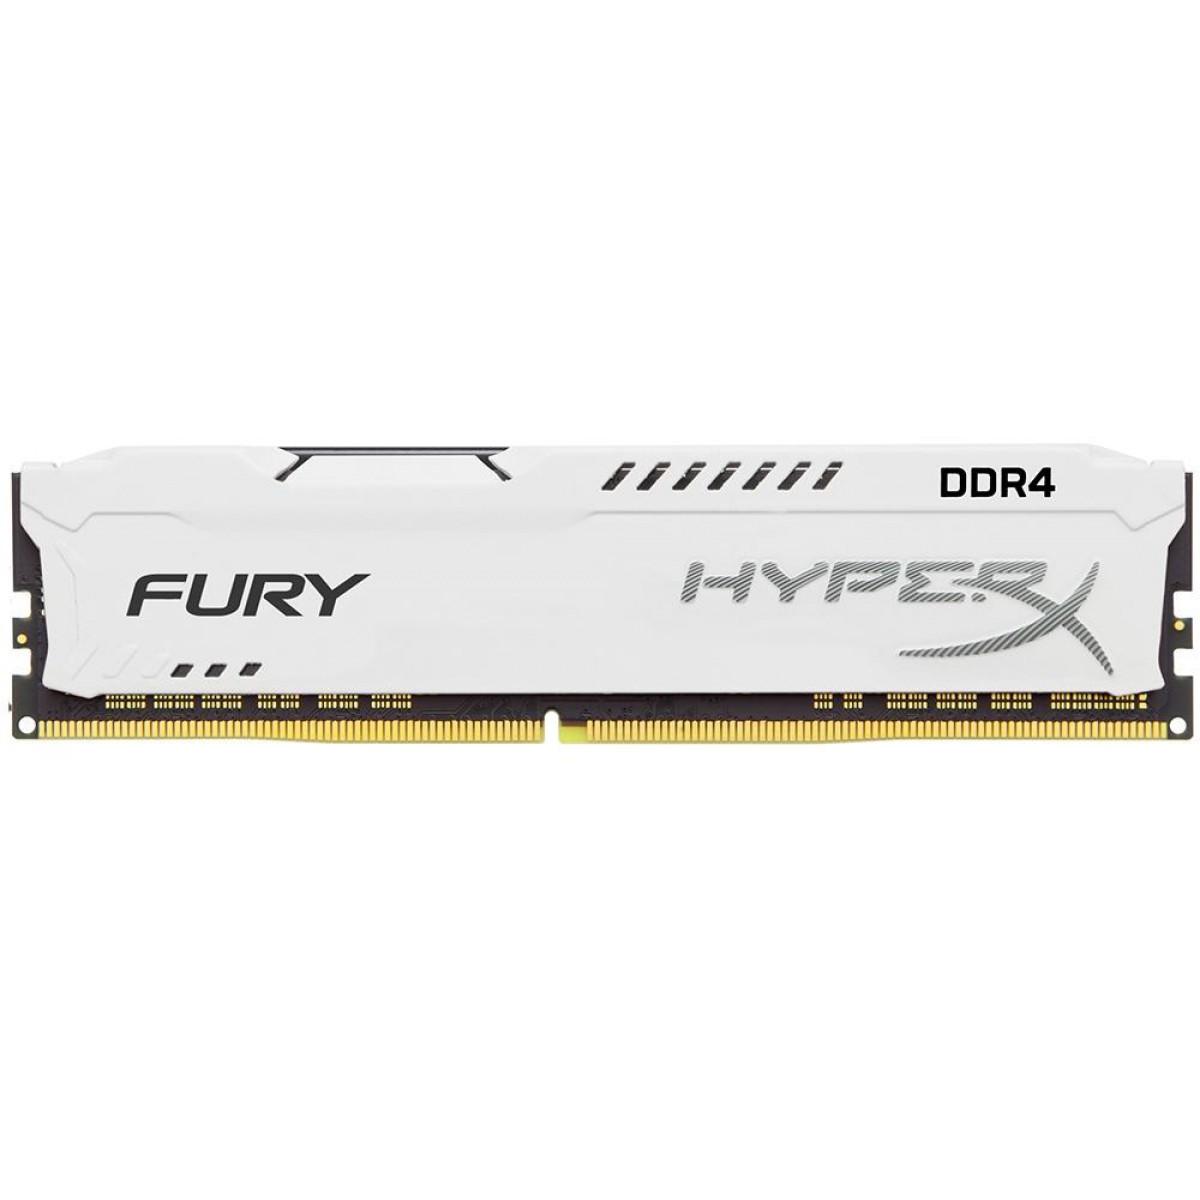 Memória DDR4 Kingston HyperX Fury, 16GB 3200MHz, White, HX432C18FW/16